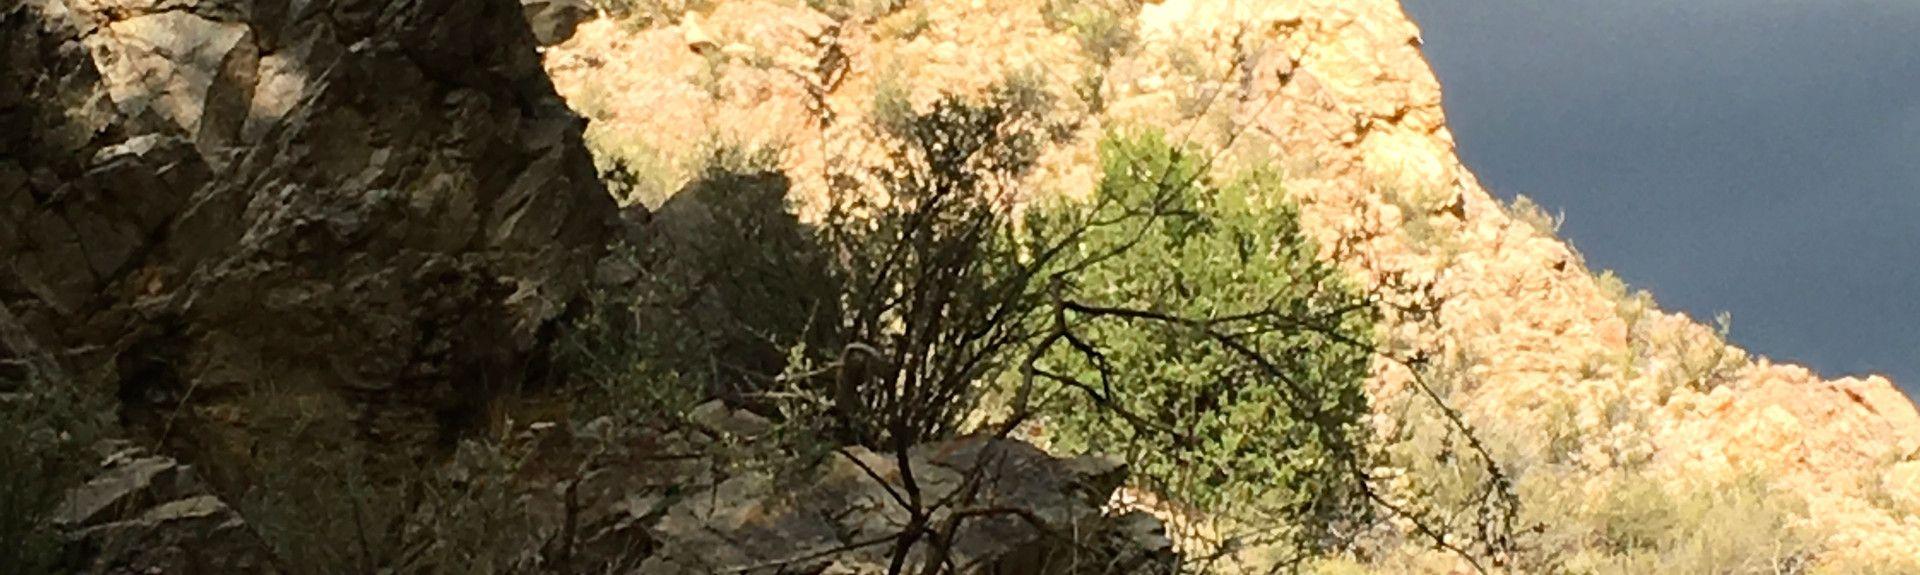 Espanola, New Mexico, Verenigde Staten